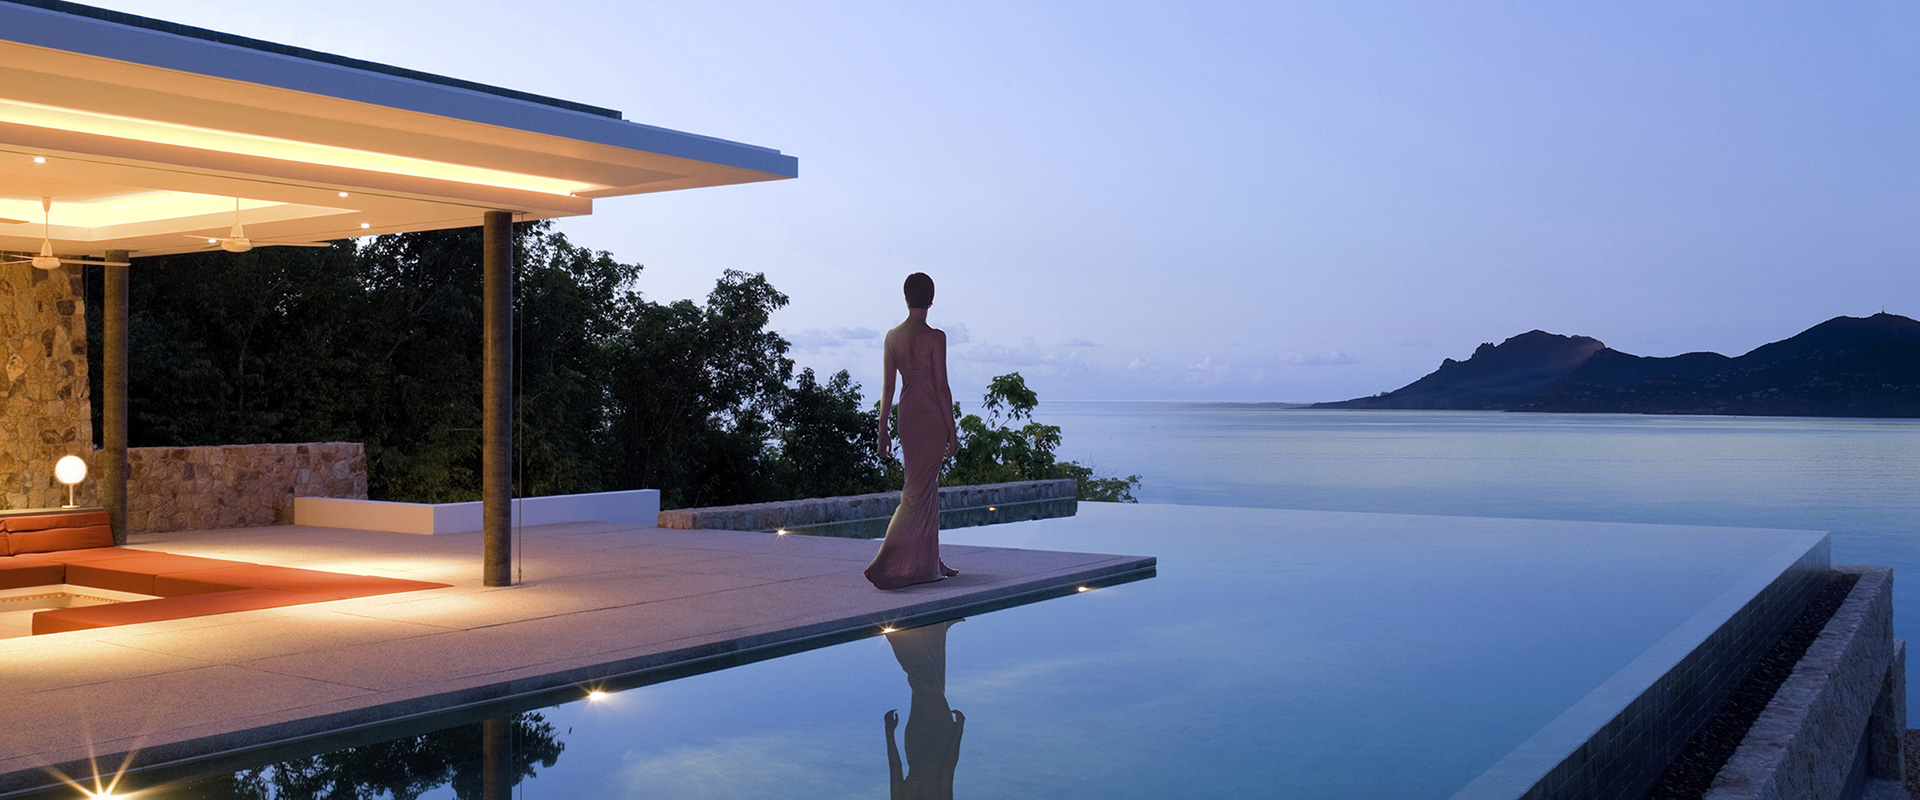 French riviera luxury real estate platinium riviera for Riviera house